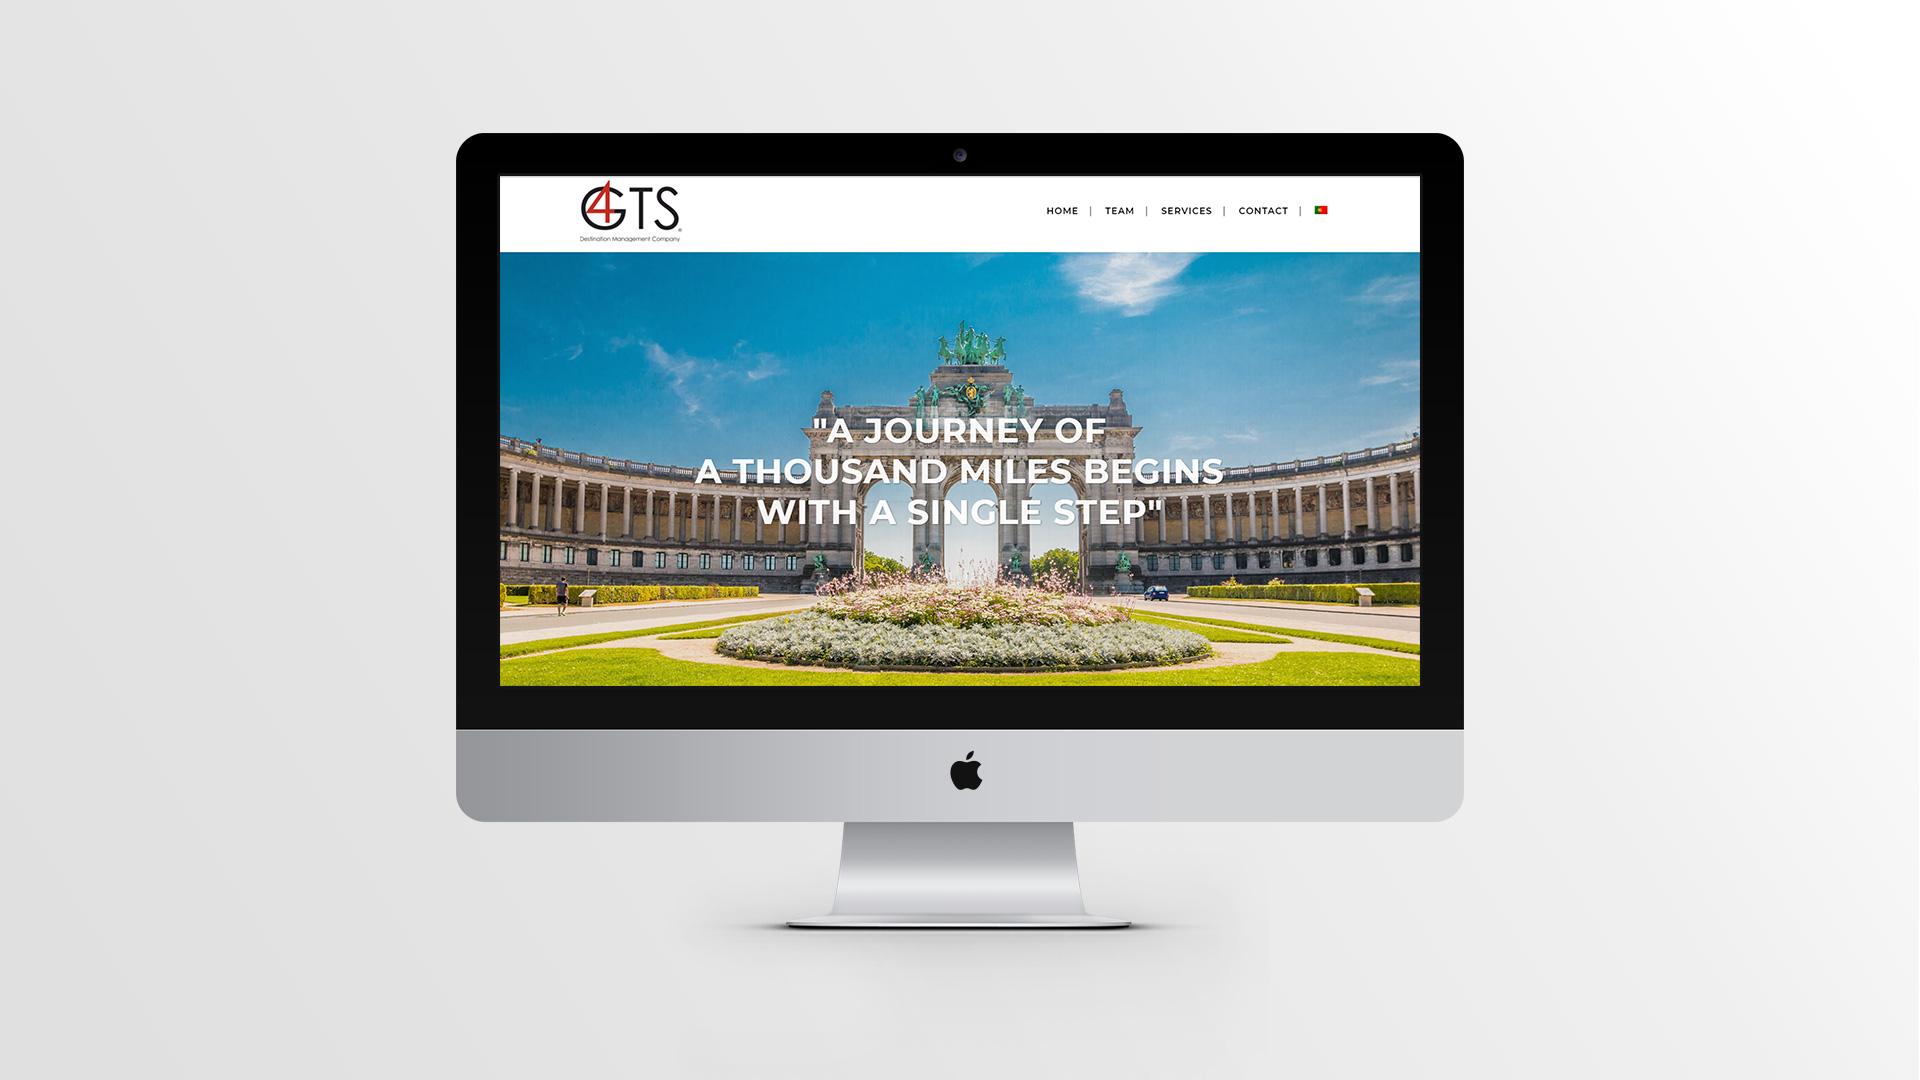 4-GTS-responsive design-web design-tours